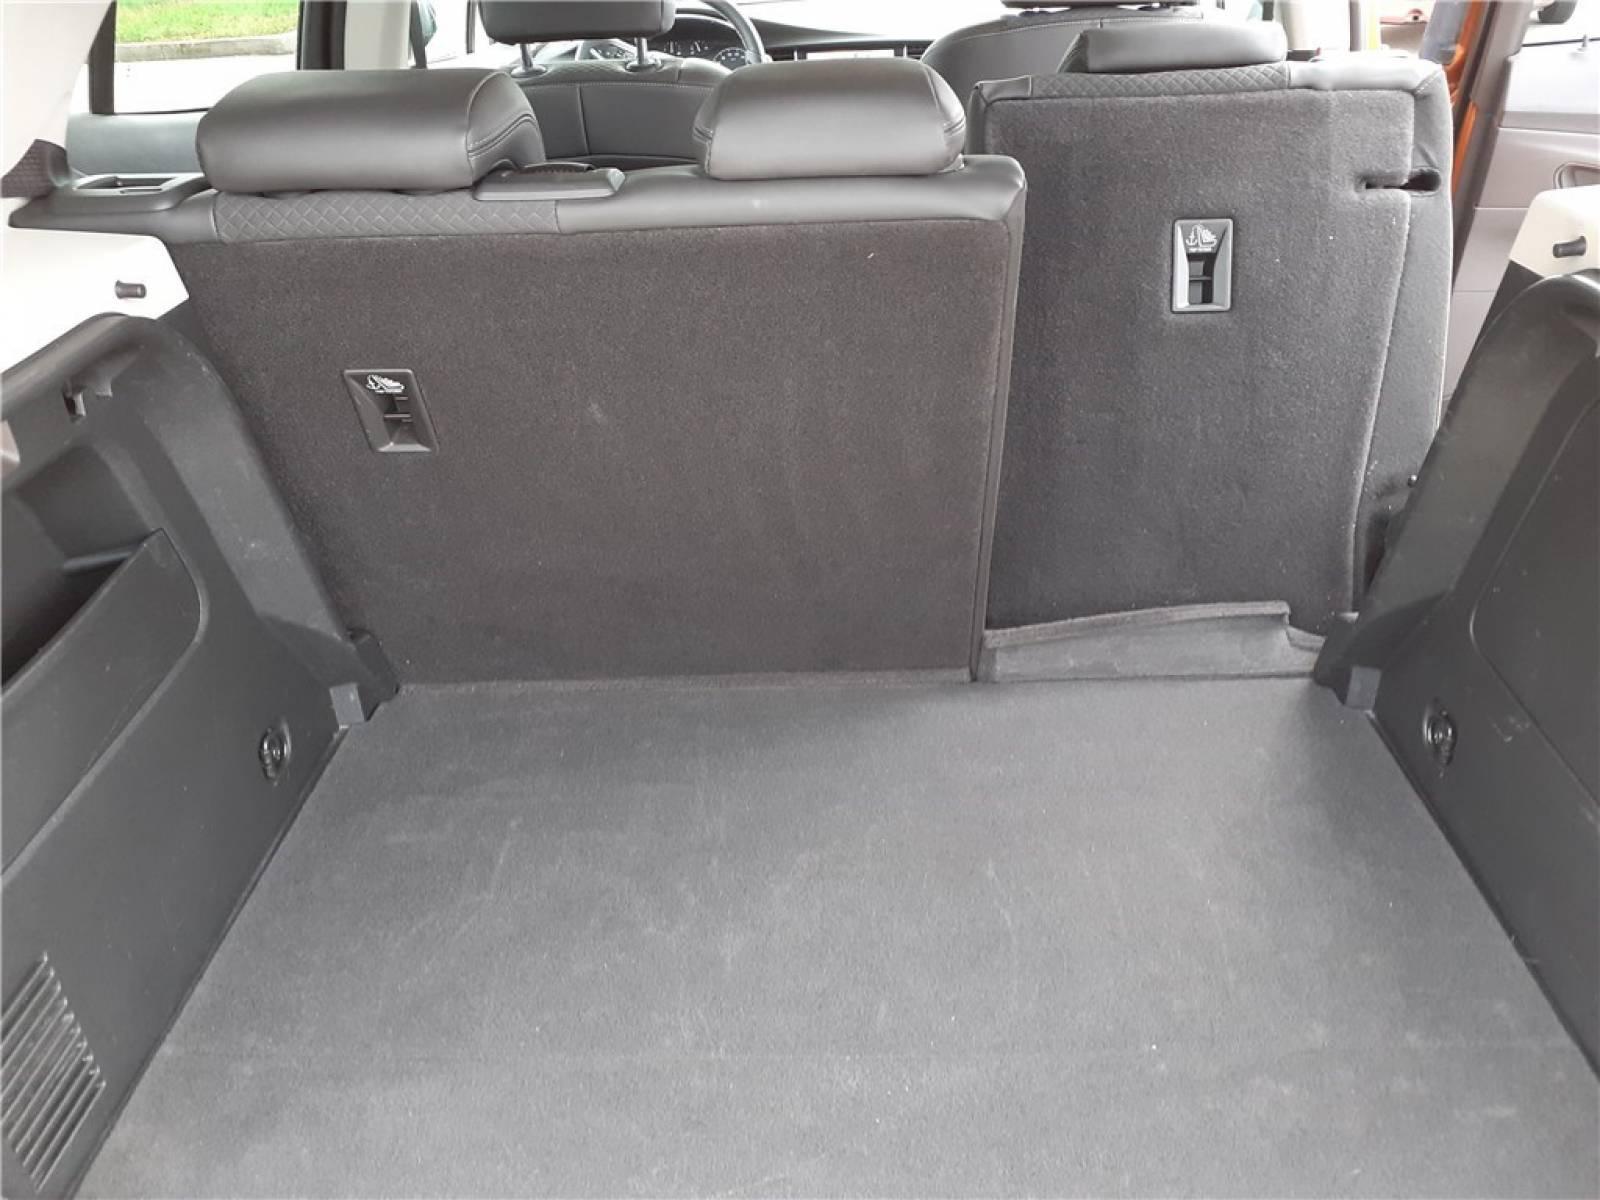 OPEL Mokka X 1.6 CDTI - 136 ch 4x2 - véhicule d'occasion - Groupe Guillet - Opel Magicauto - Chalon-sur-Saône - 71380 - Saint-Marcel - 24